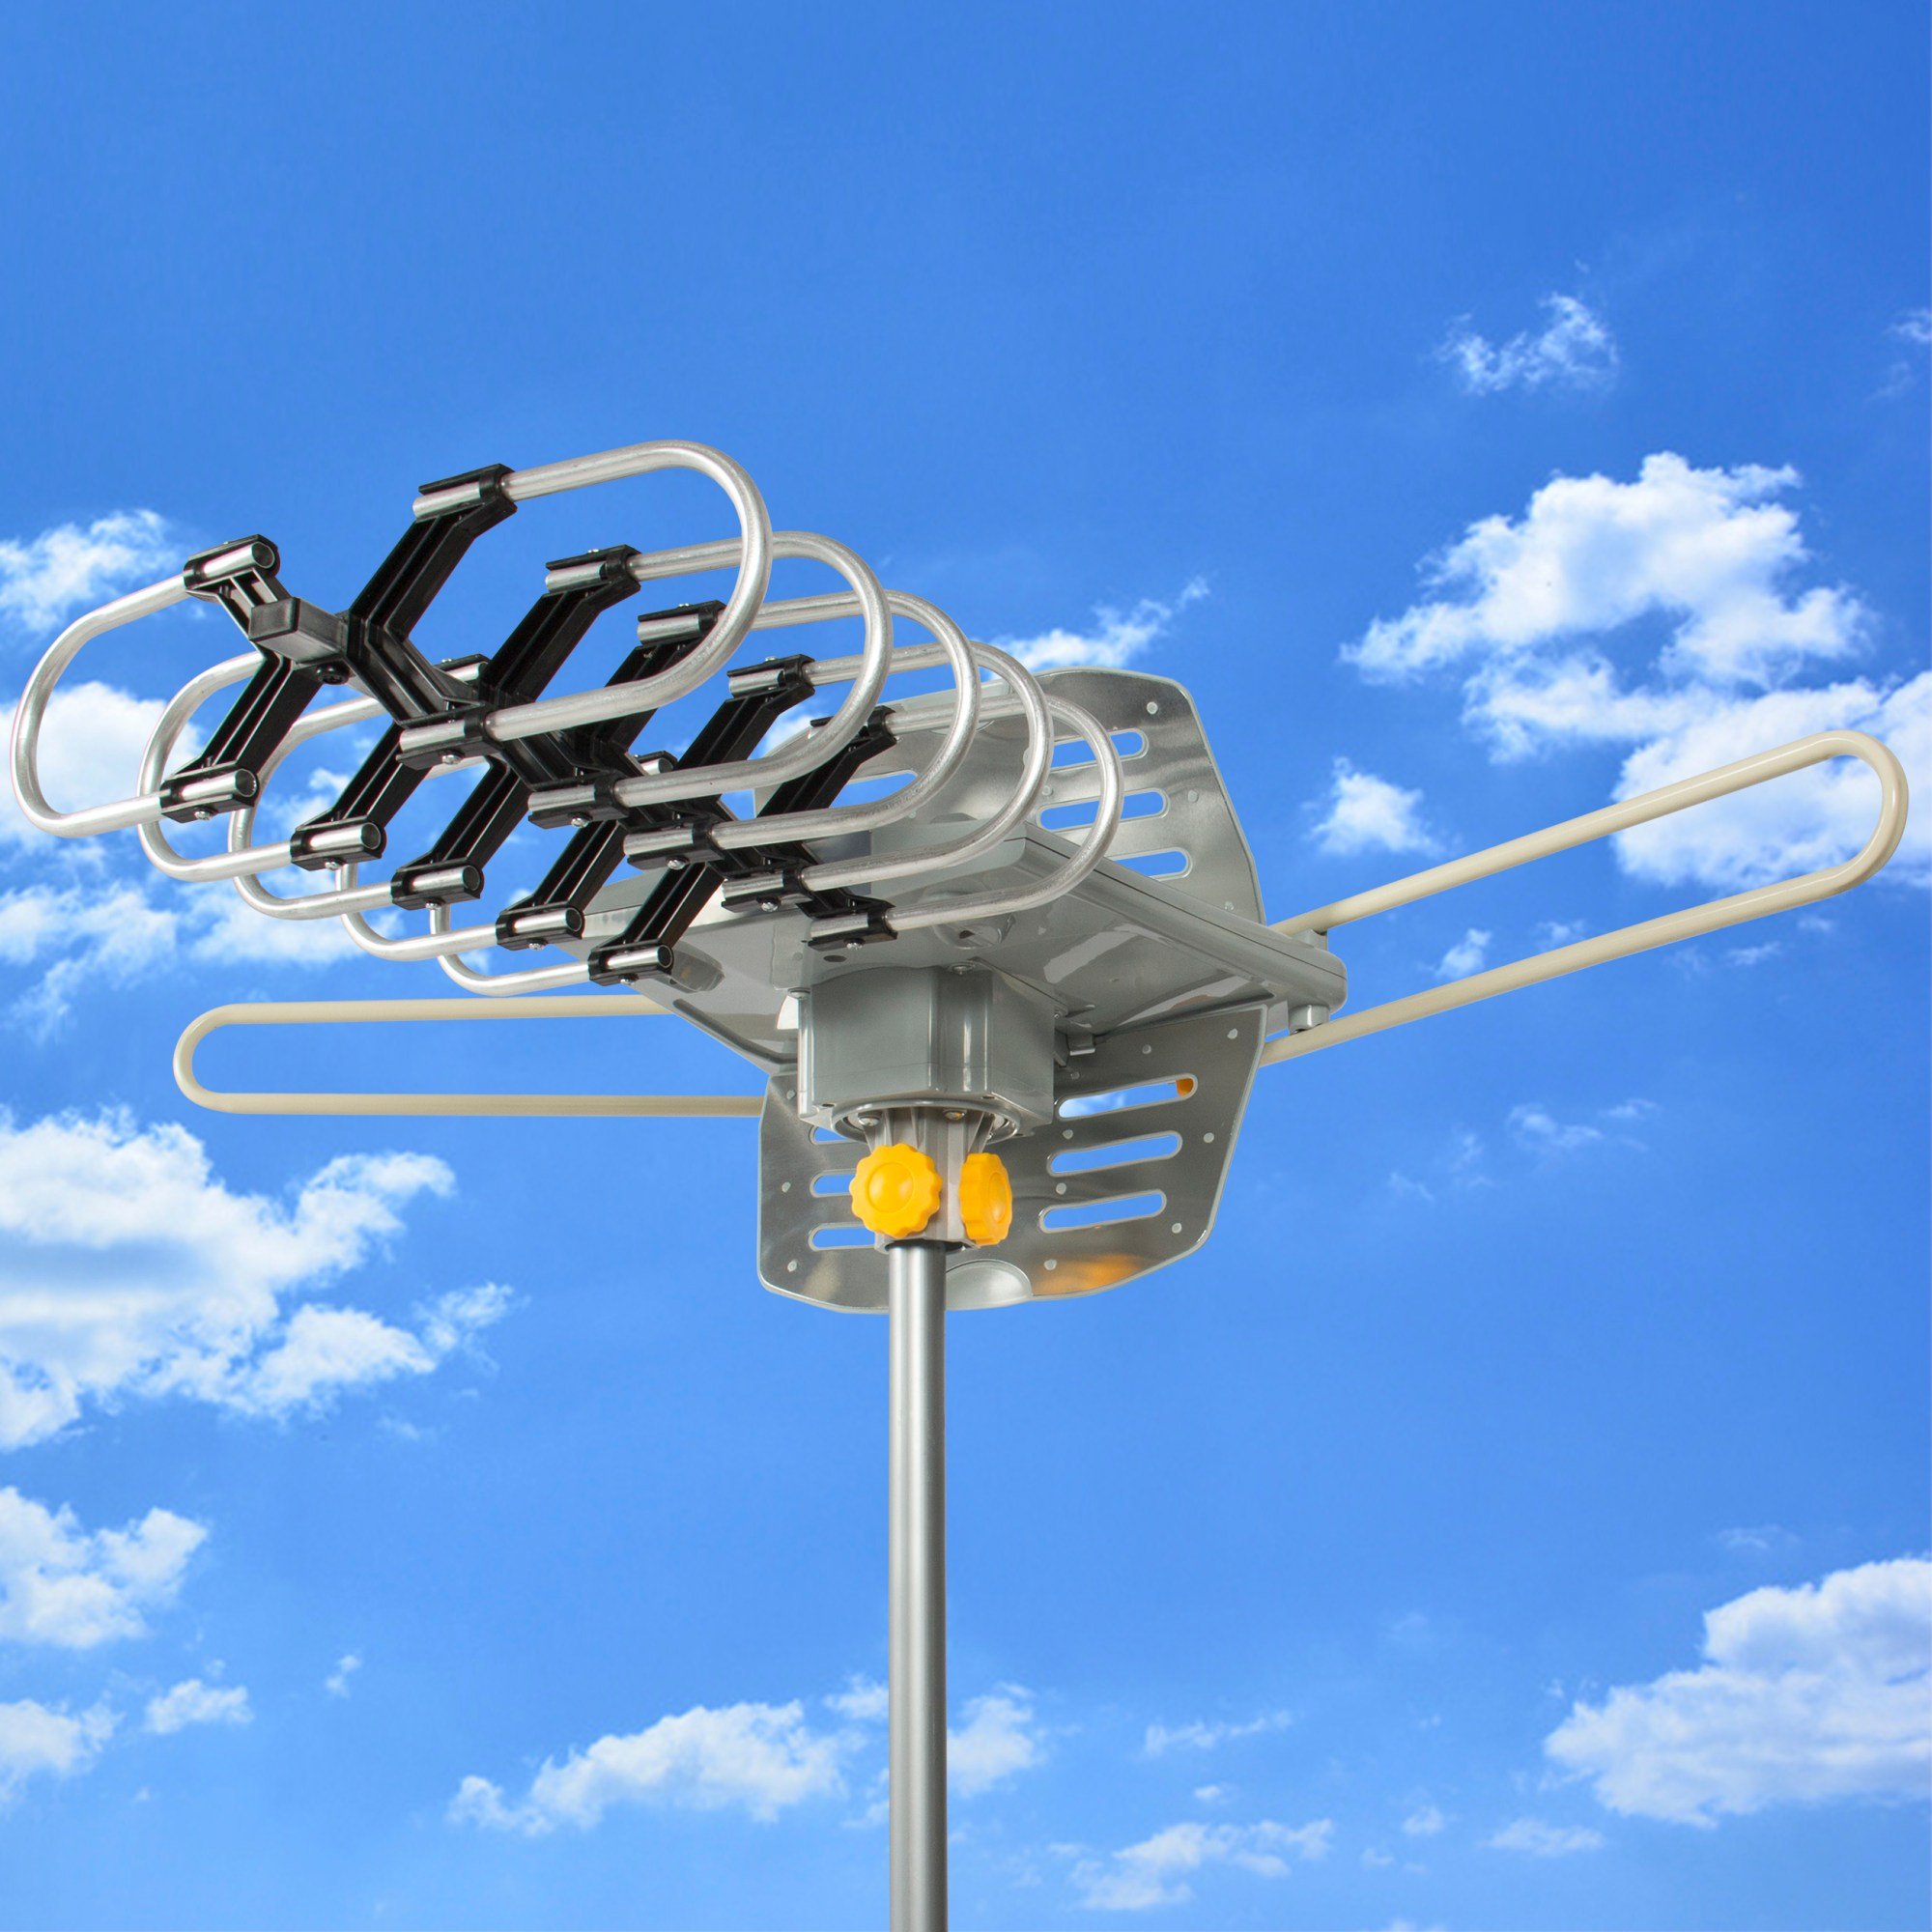 hight resolution of channel master cm 4228hd extremetenna 80 hd outdoor antenna walmart com